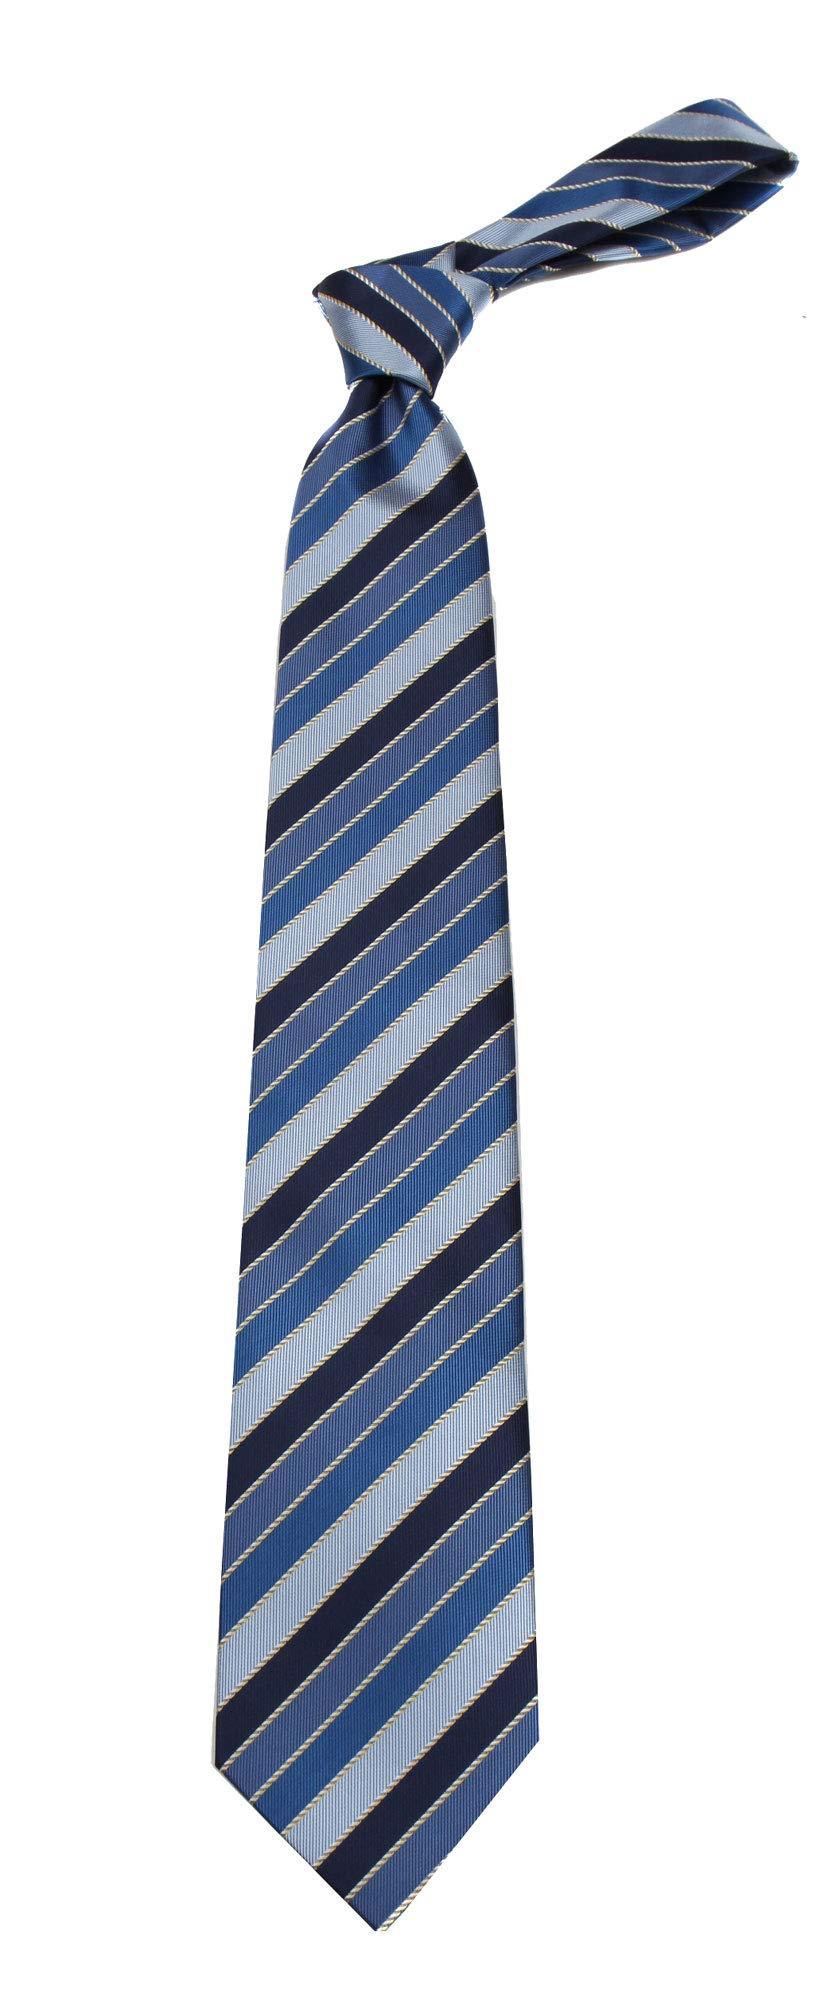 B-11699 - Boys Youth Navy Stripe Designer Necktie Ties